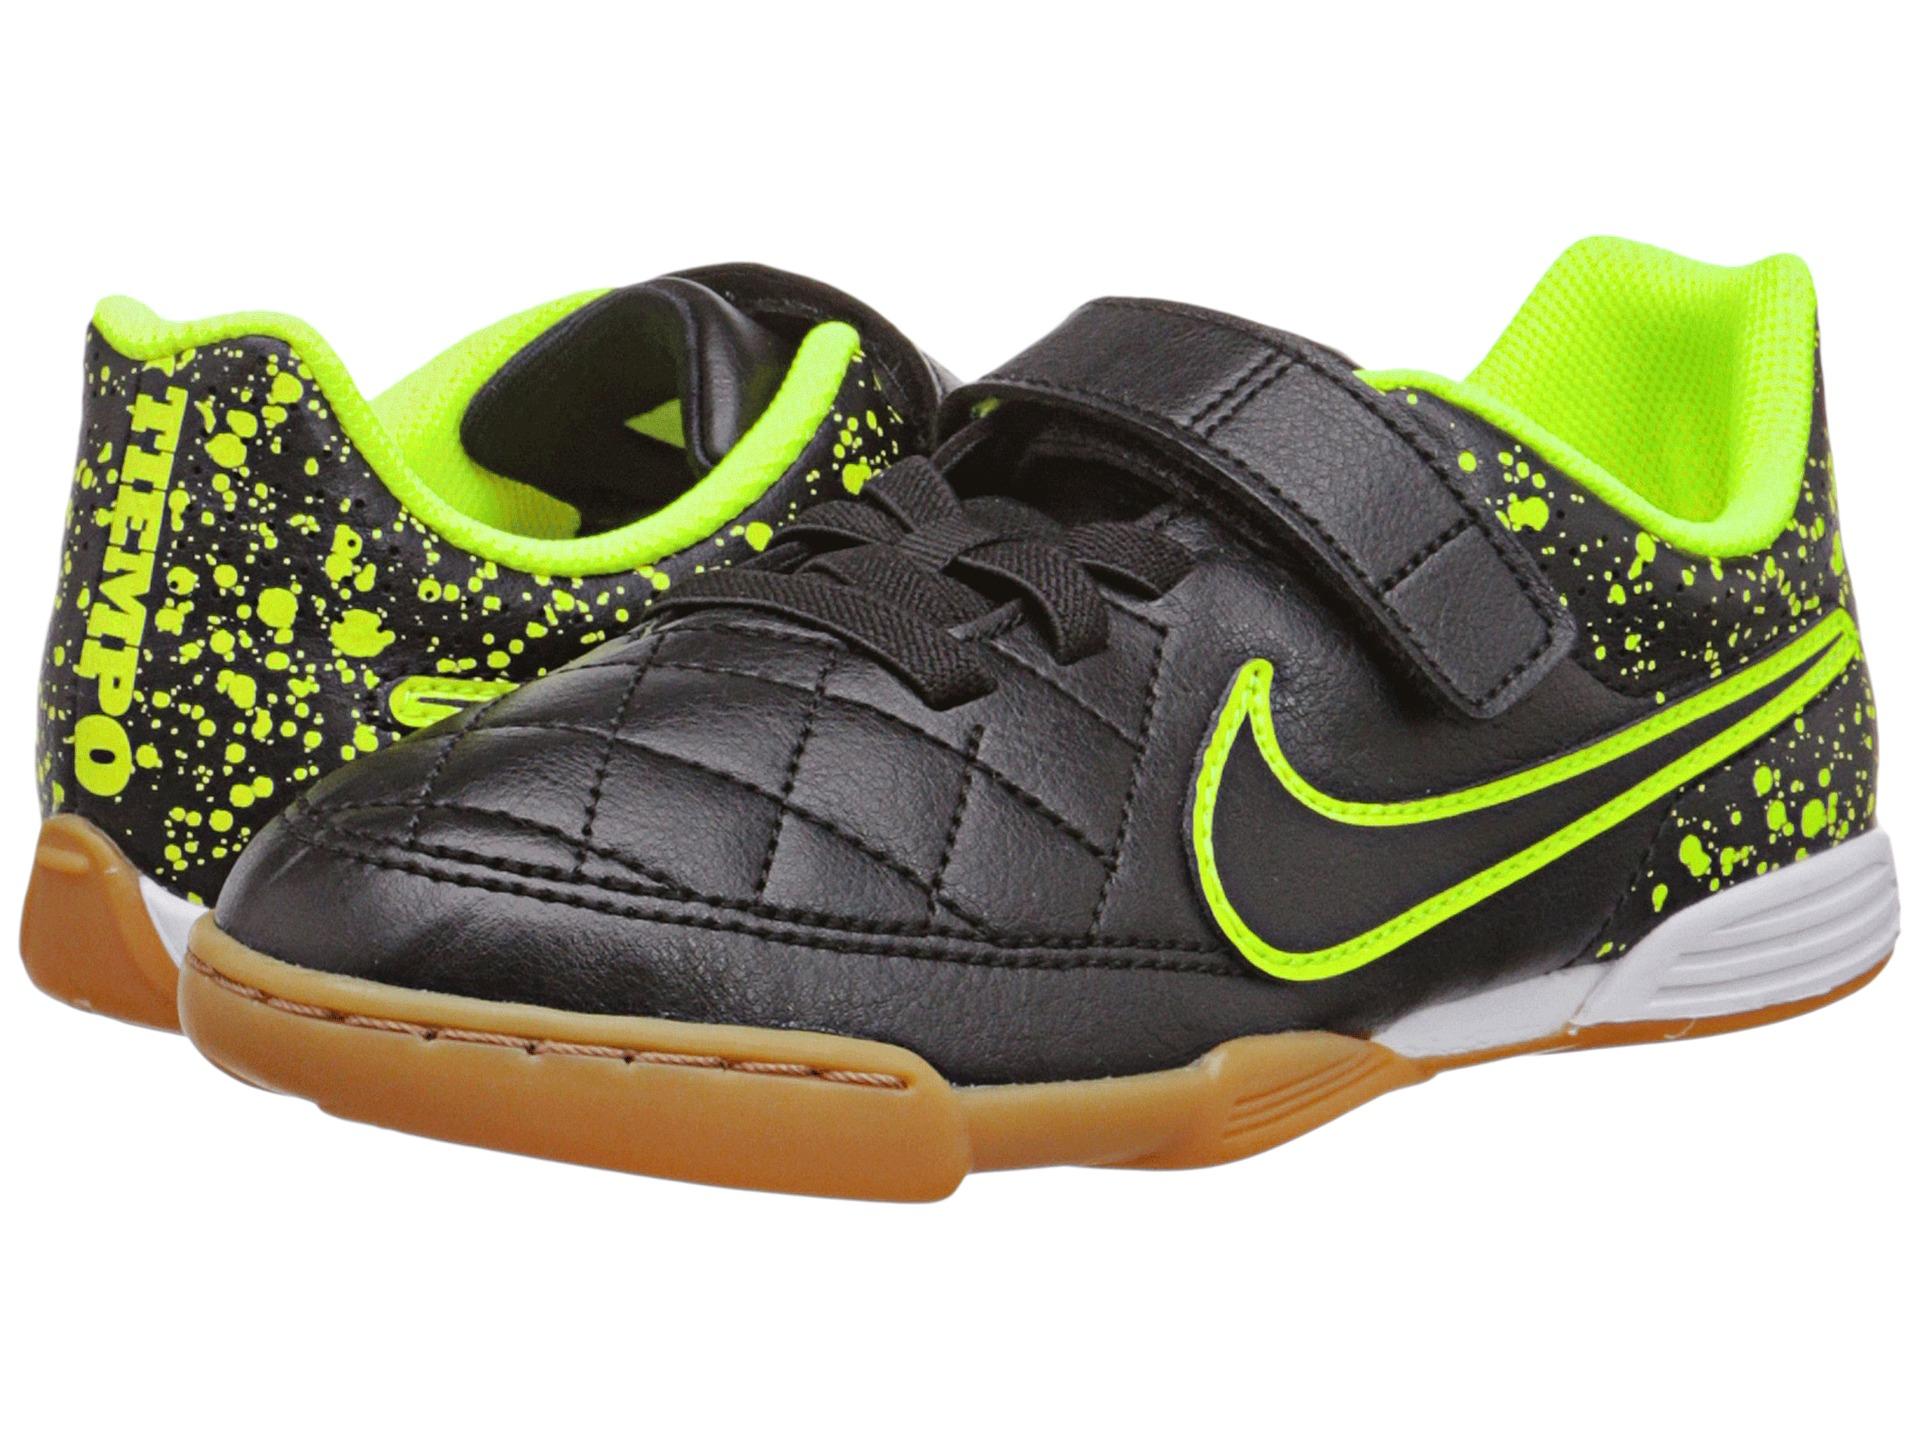 Toddler Size  Indoor Soccer Shoes